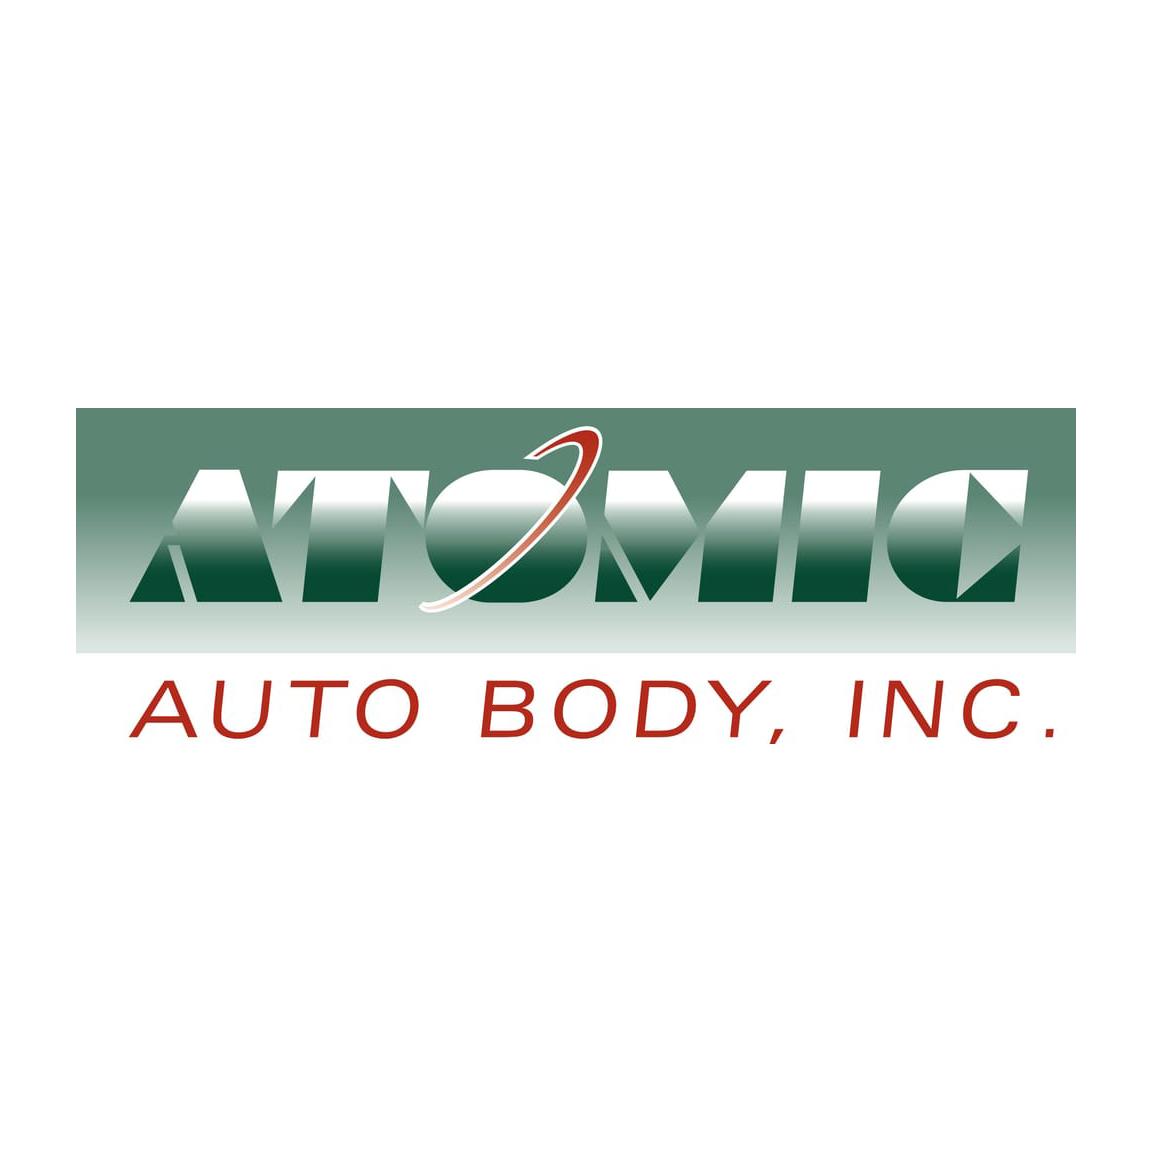 Atomic Auto Body, Inc